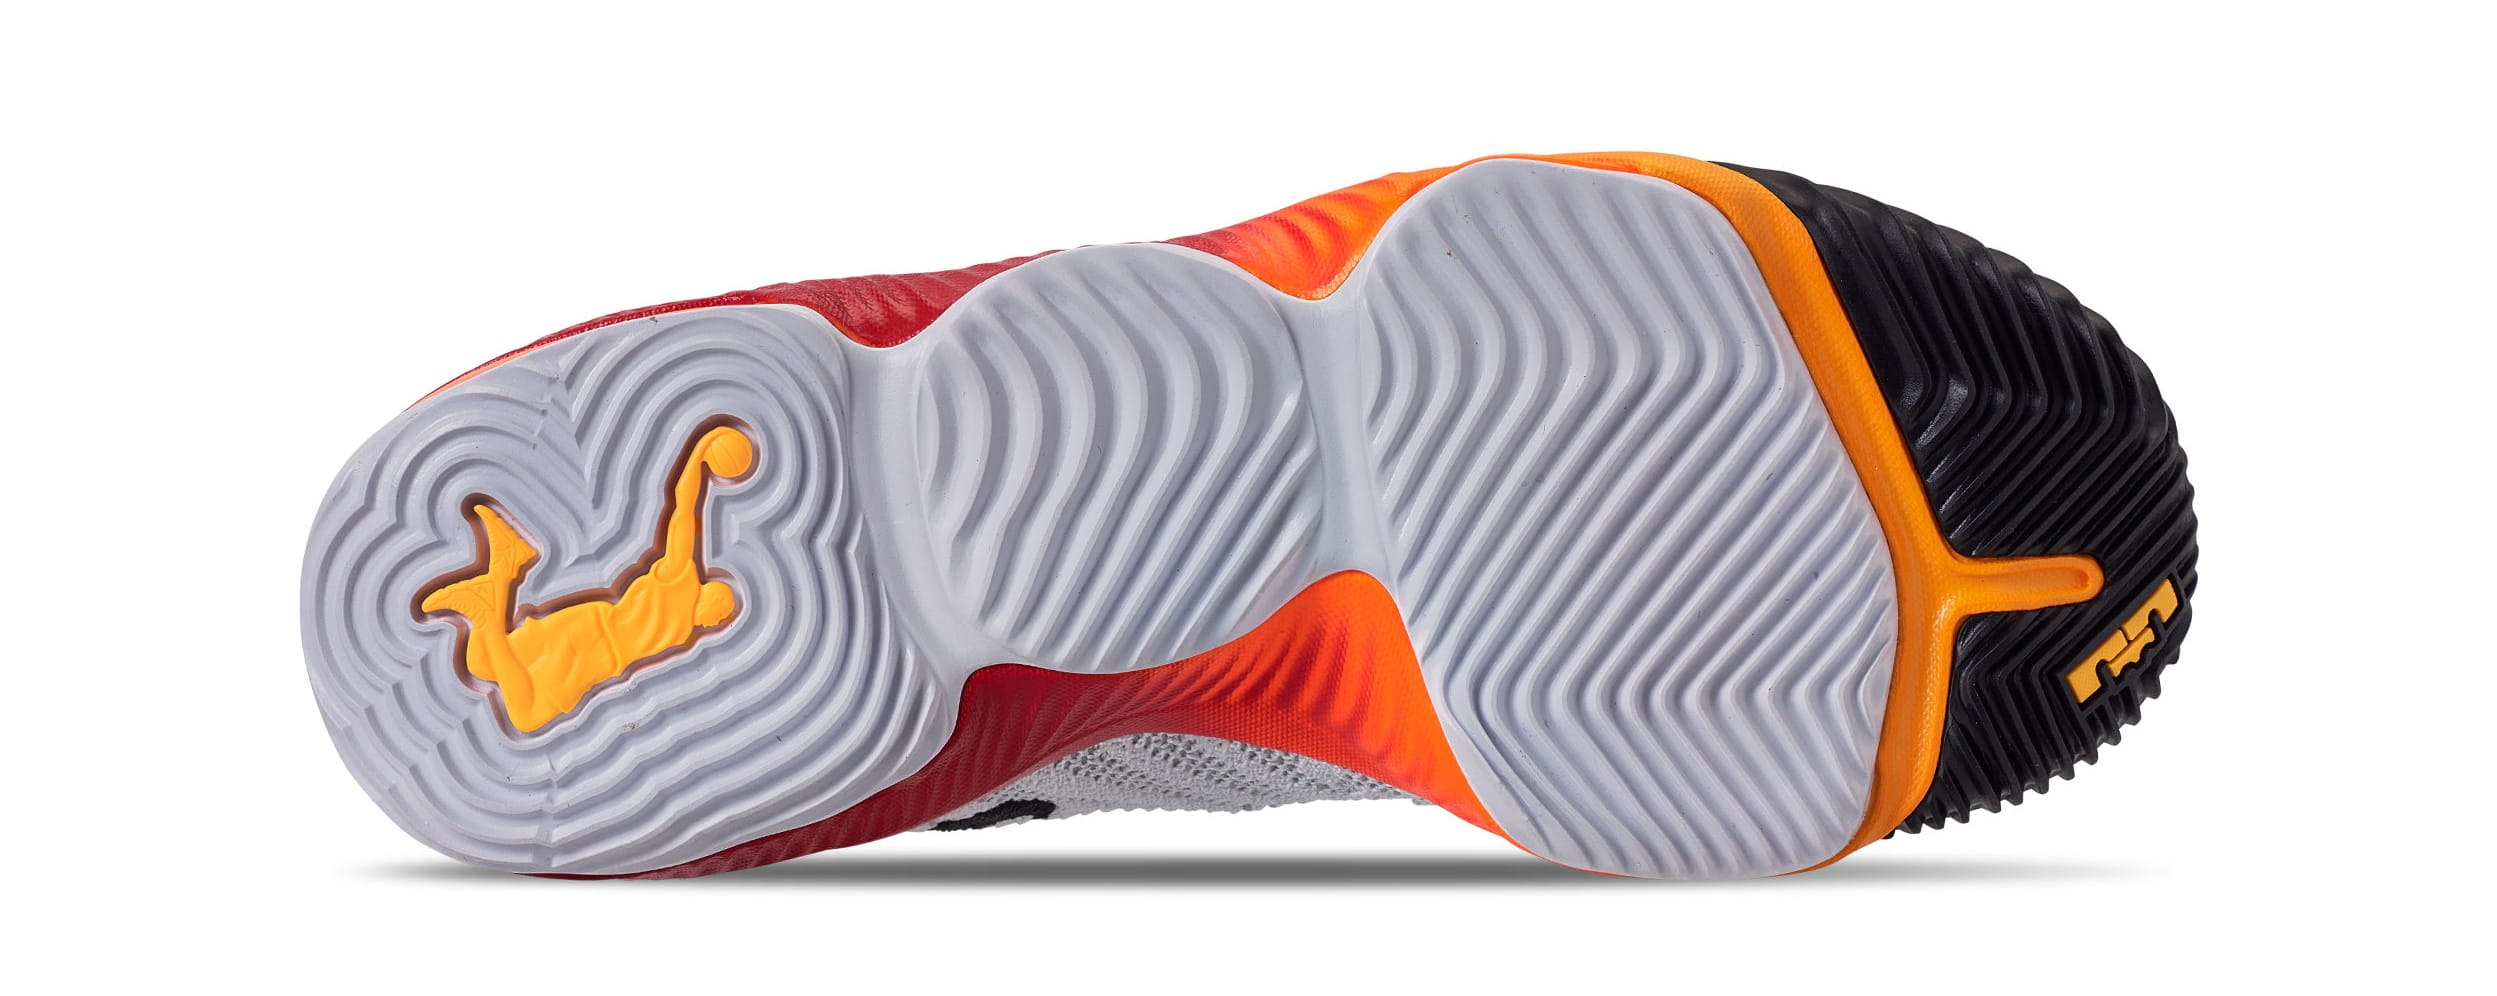 newest eaa13 d4717 Nike LeBron 16 Boys 'White/Laser Orange' AQ2465-188 Release ...